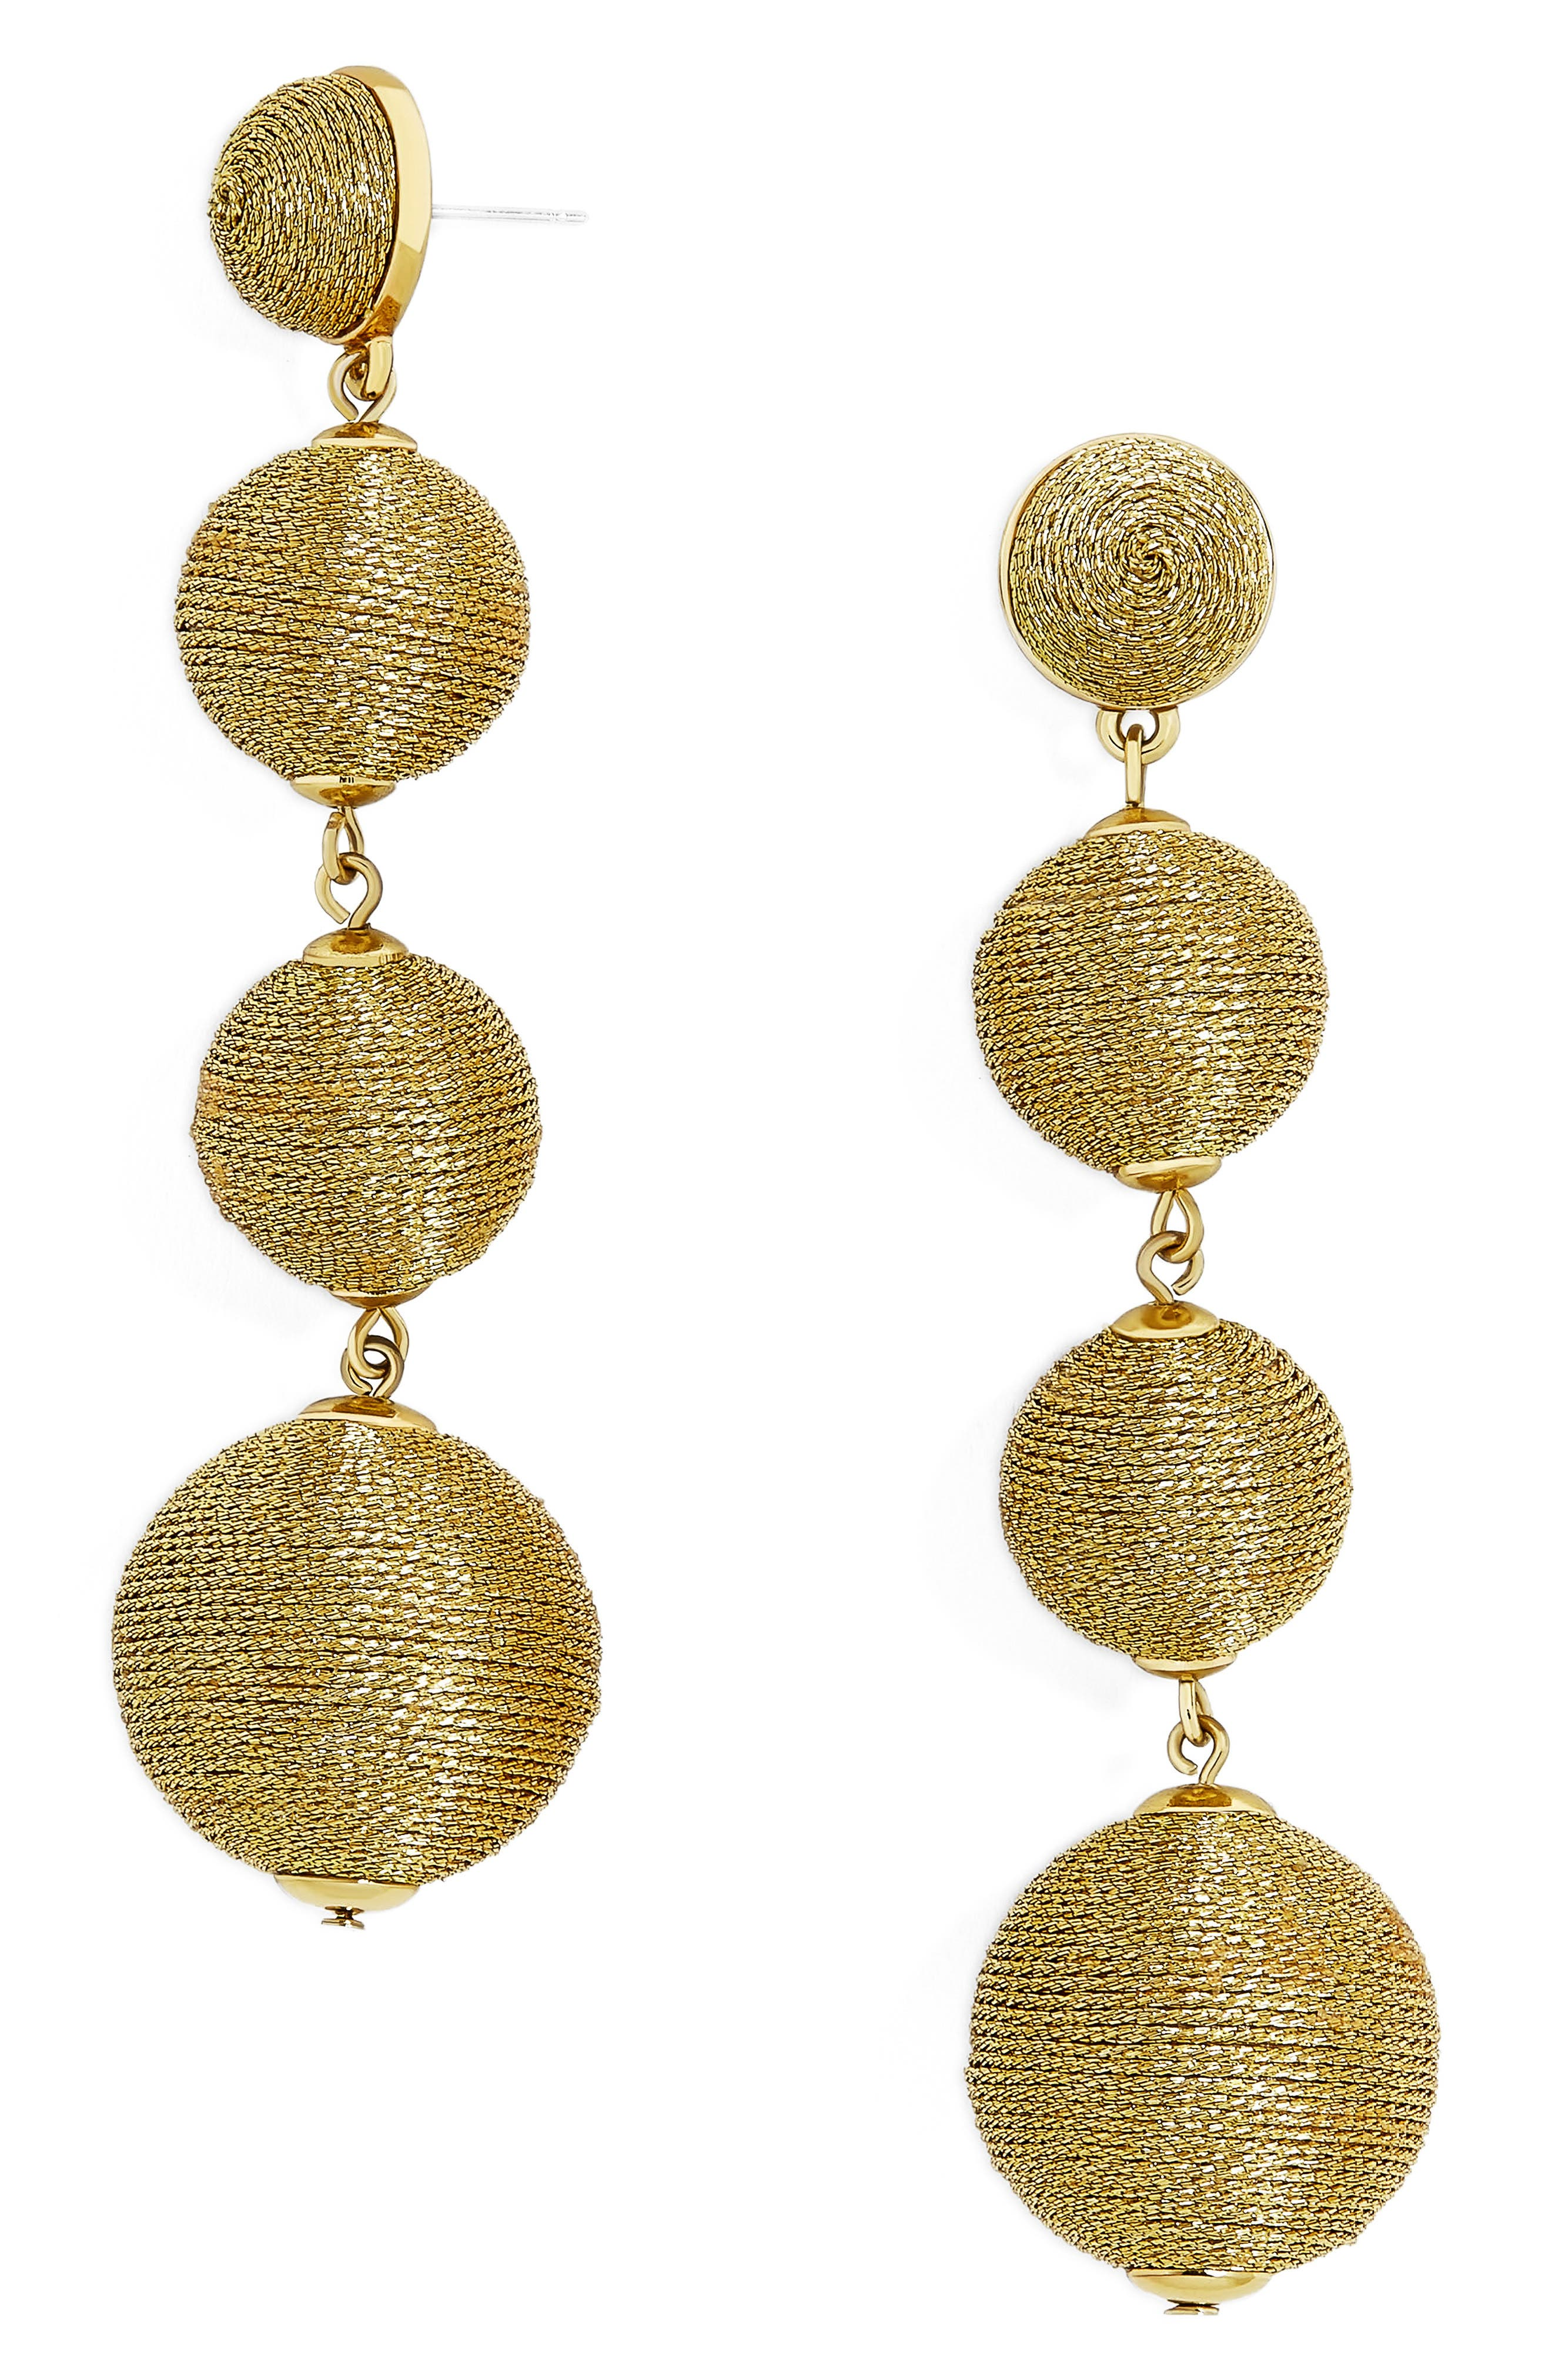 Criselda Ball Shoulder Duster Earrings,                         Main,                         color, Gold